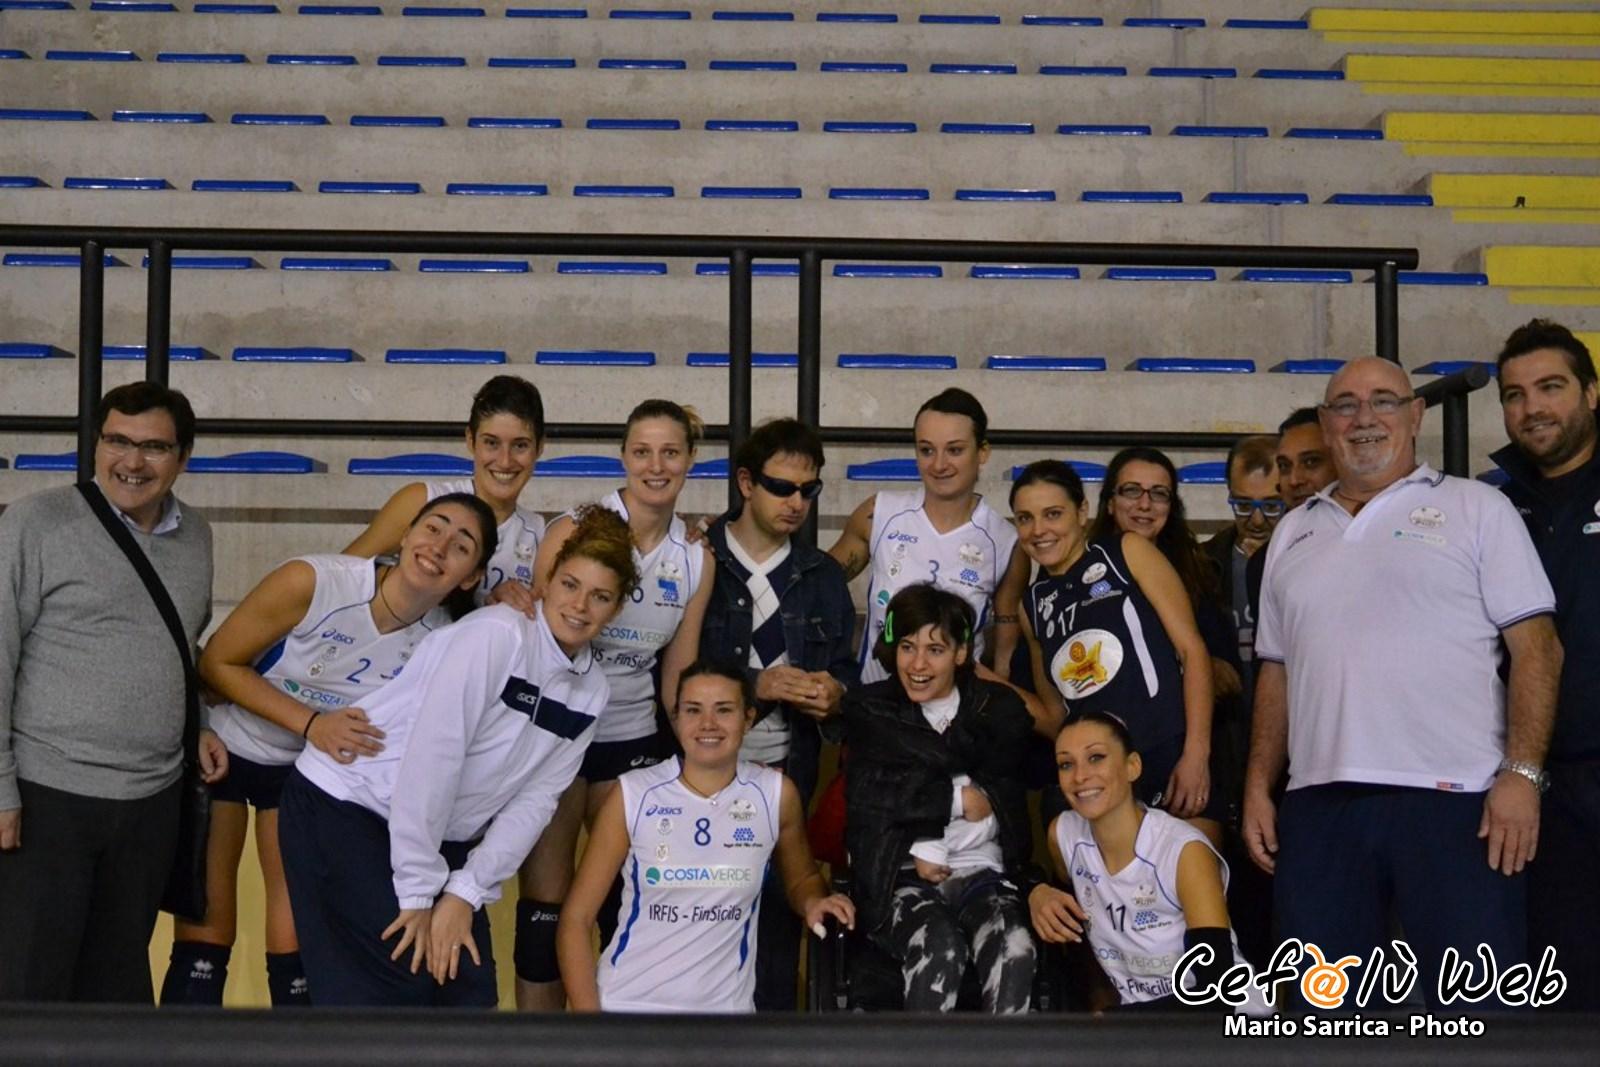 Costaverde Cefalù Volley VS Barcellona PG 95 ME [Foto]